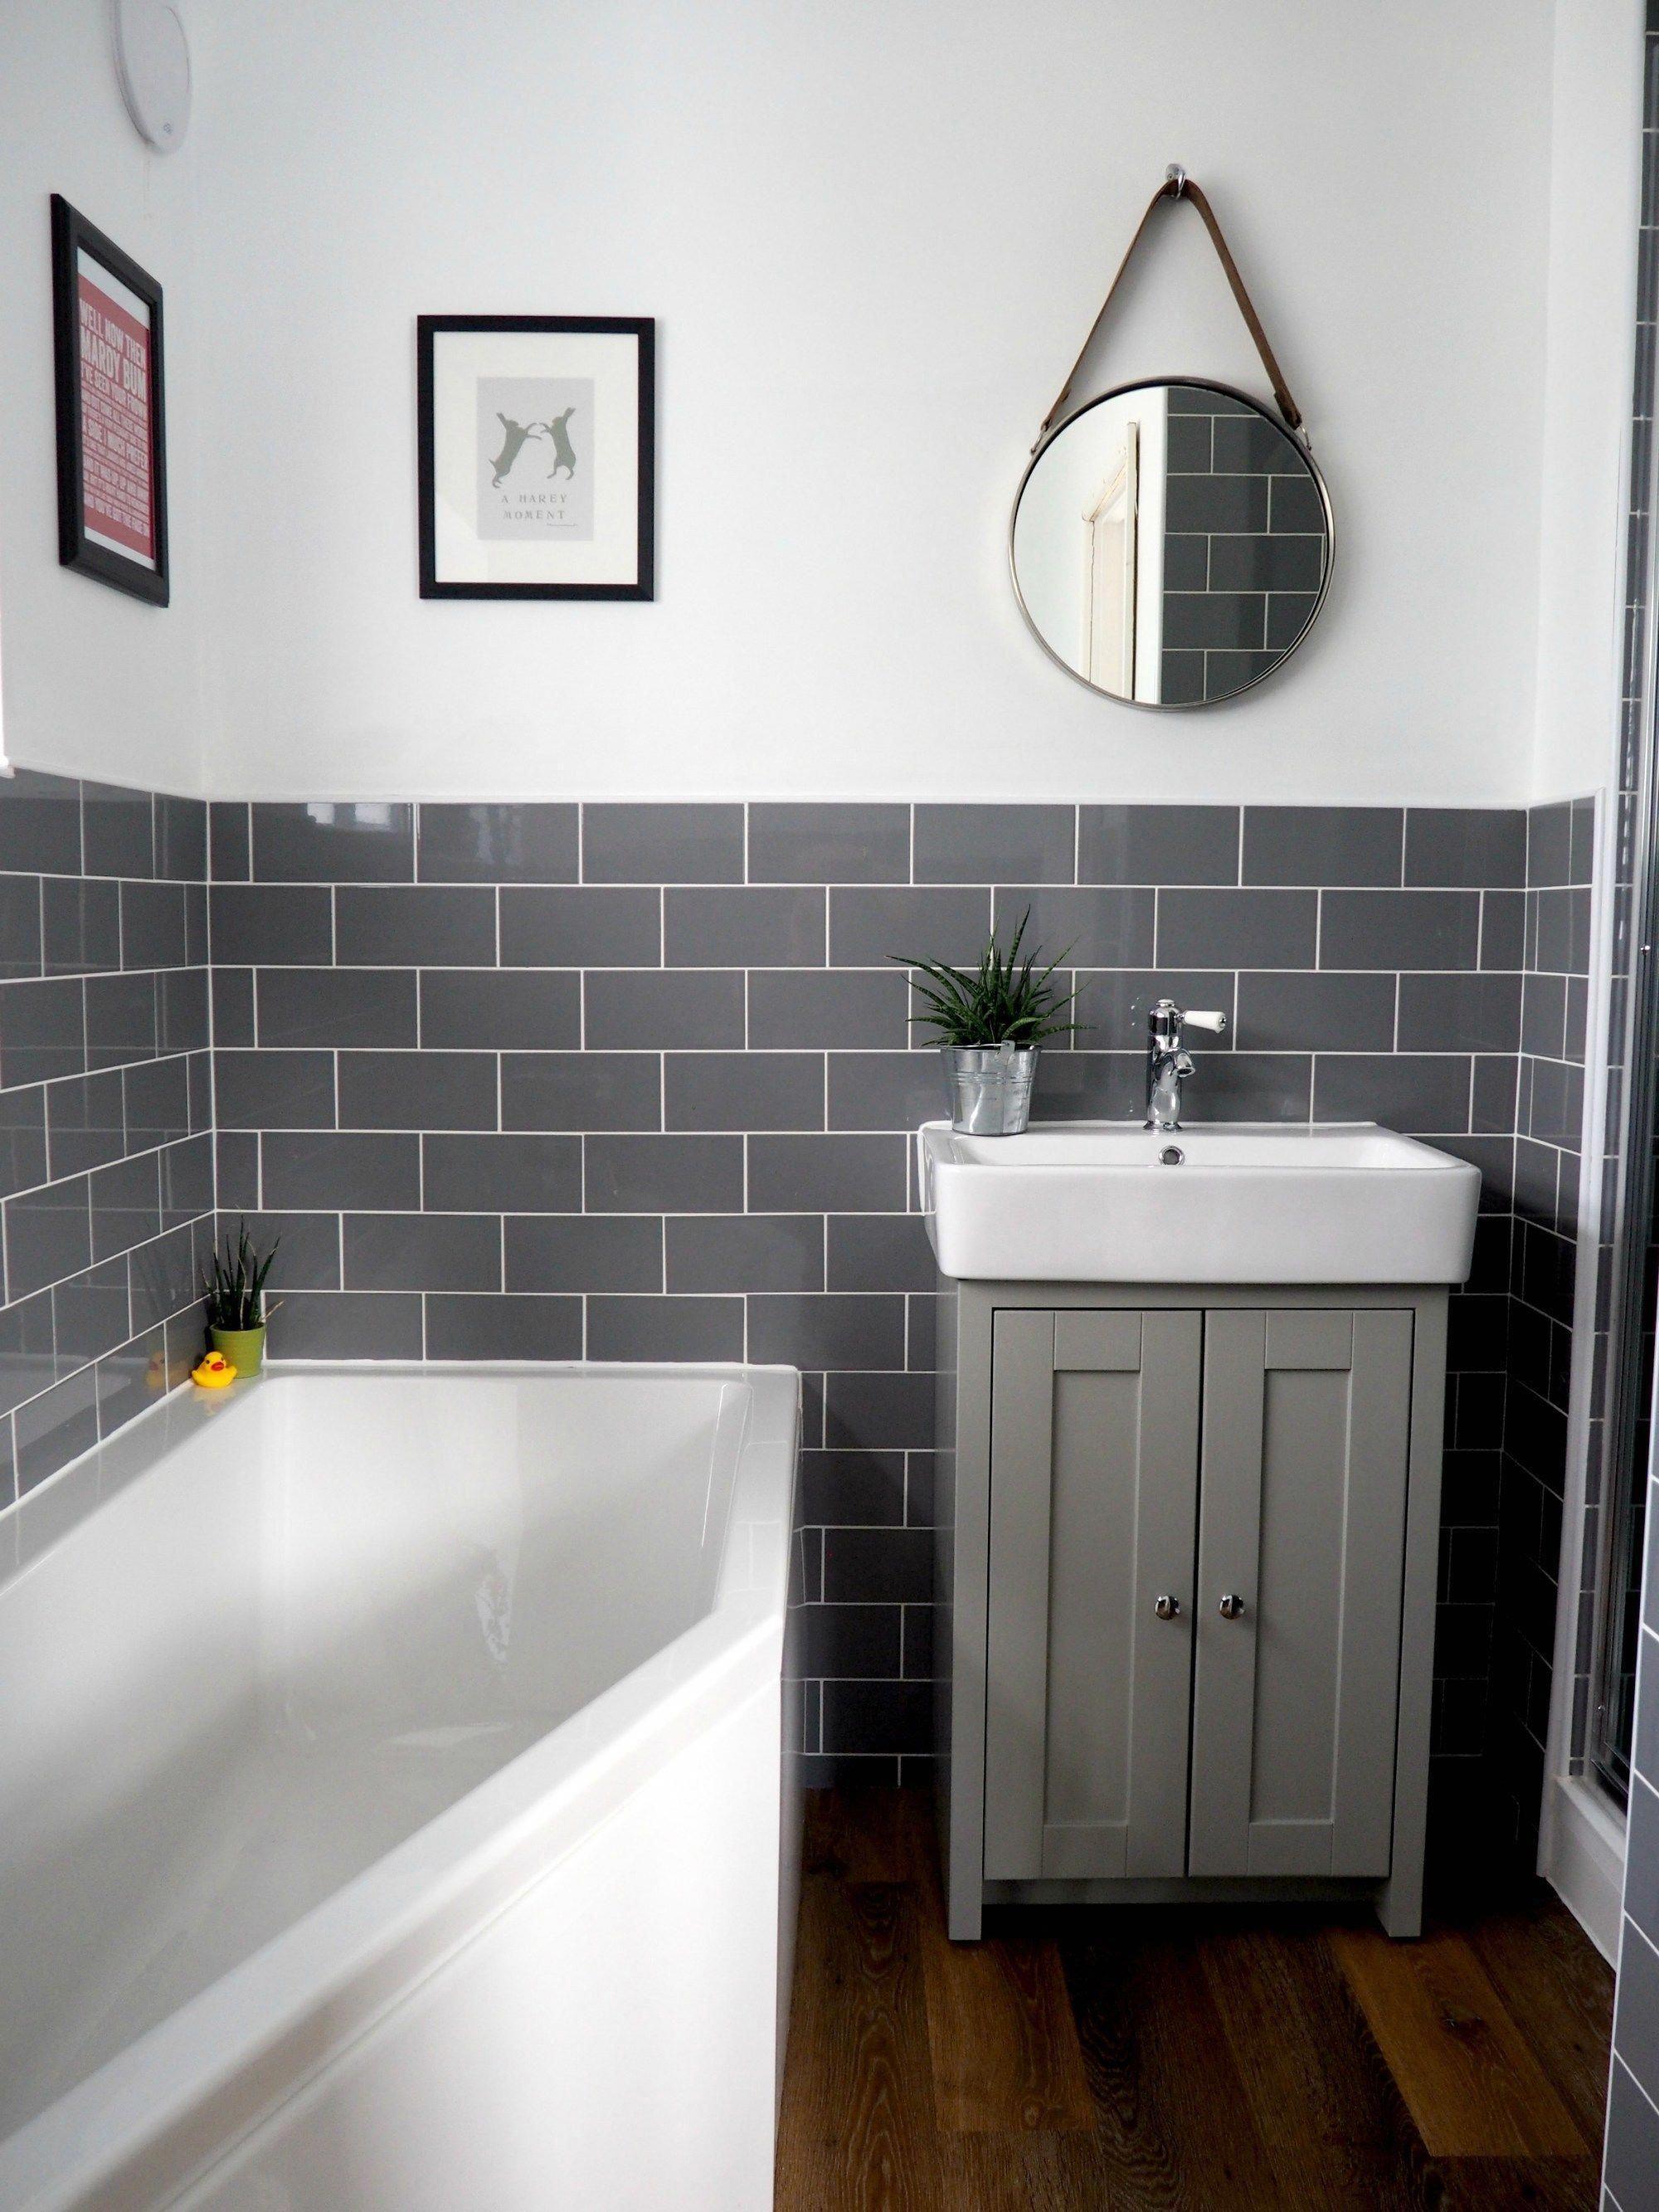 Bathroom Renovation Ideas Bathroom Remodel Cost Bathroom Ideas For Small Bathrooms Small Bathroo Bathroom Remodel Cost Simple Bathroom Bathroom Design Small